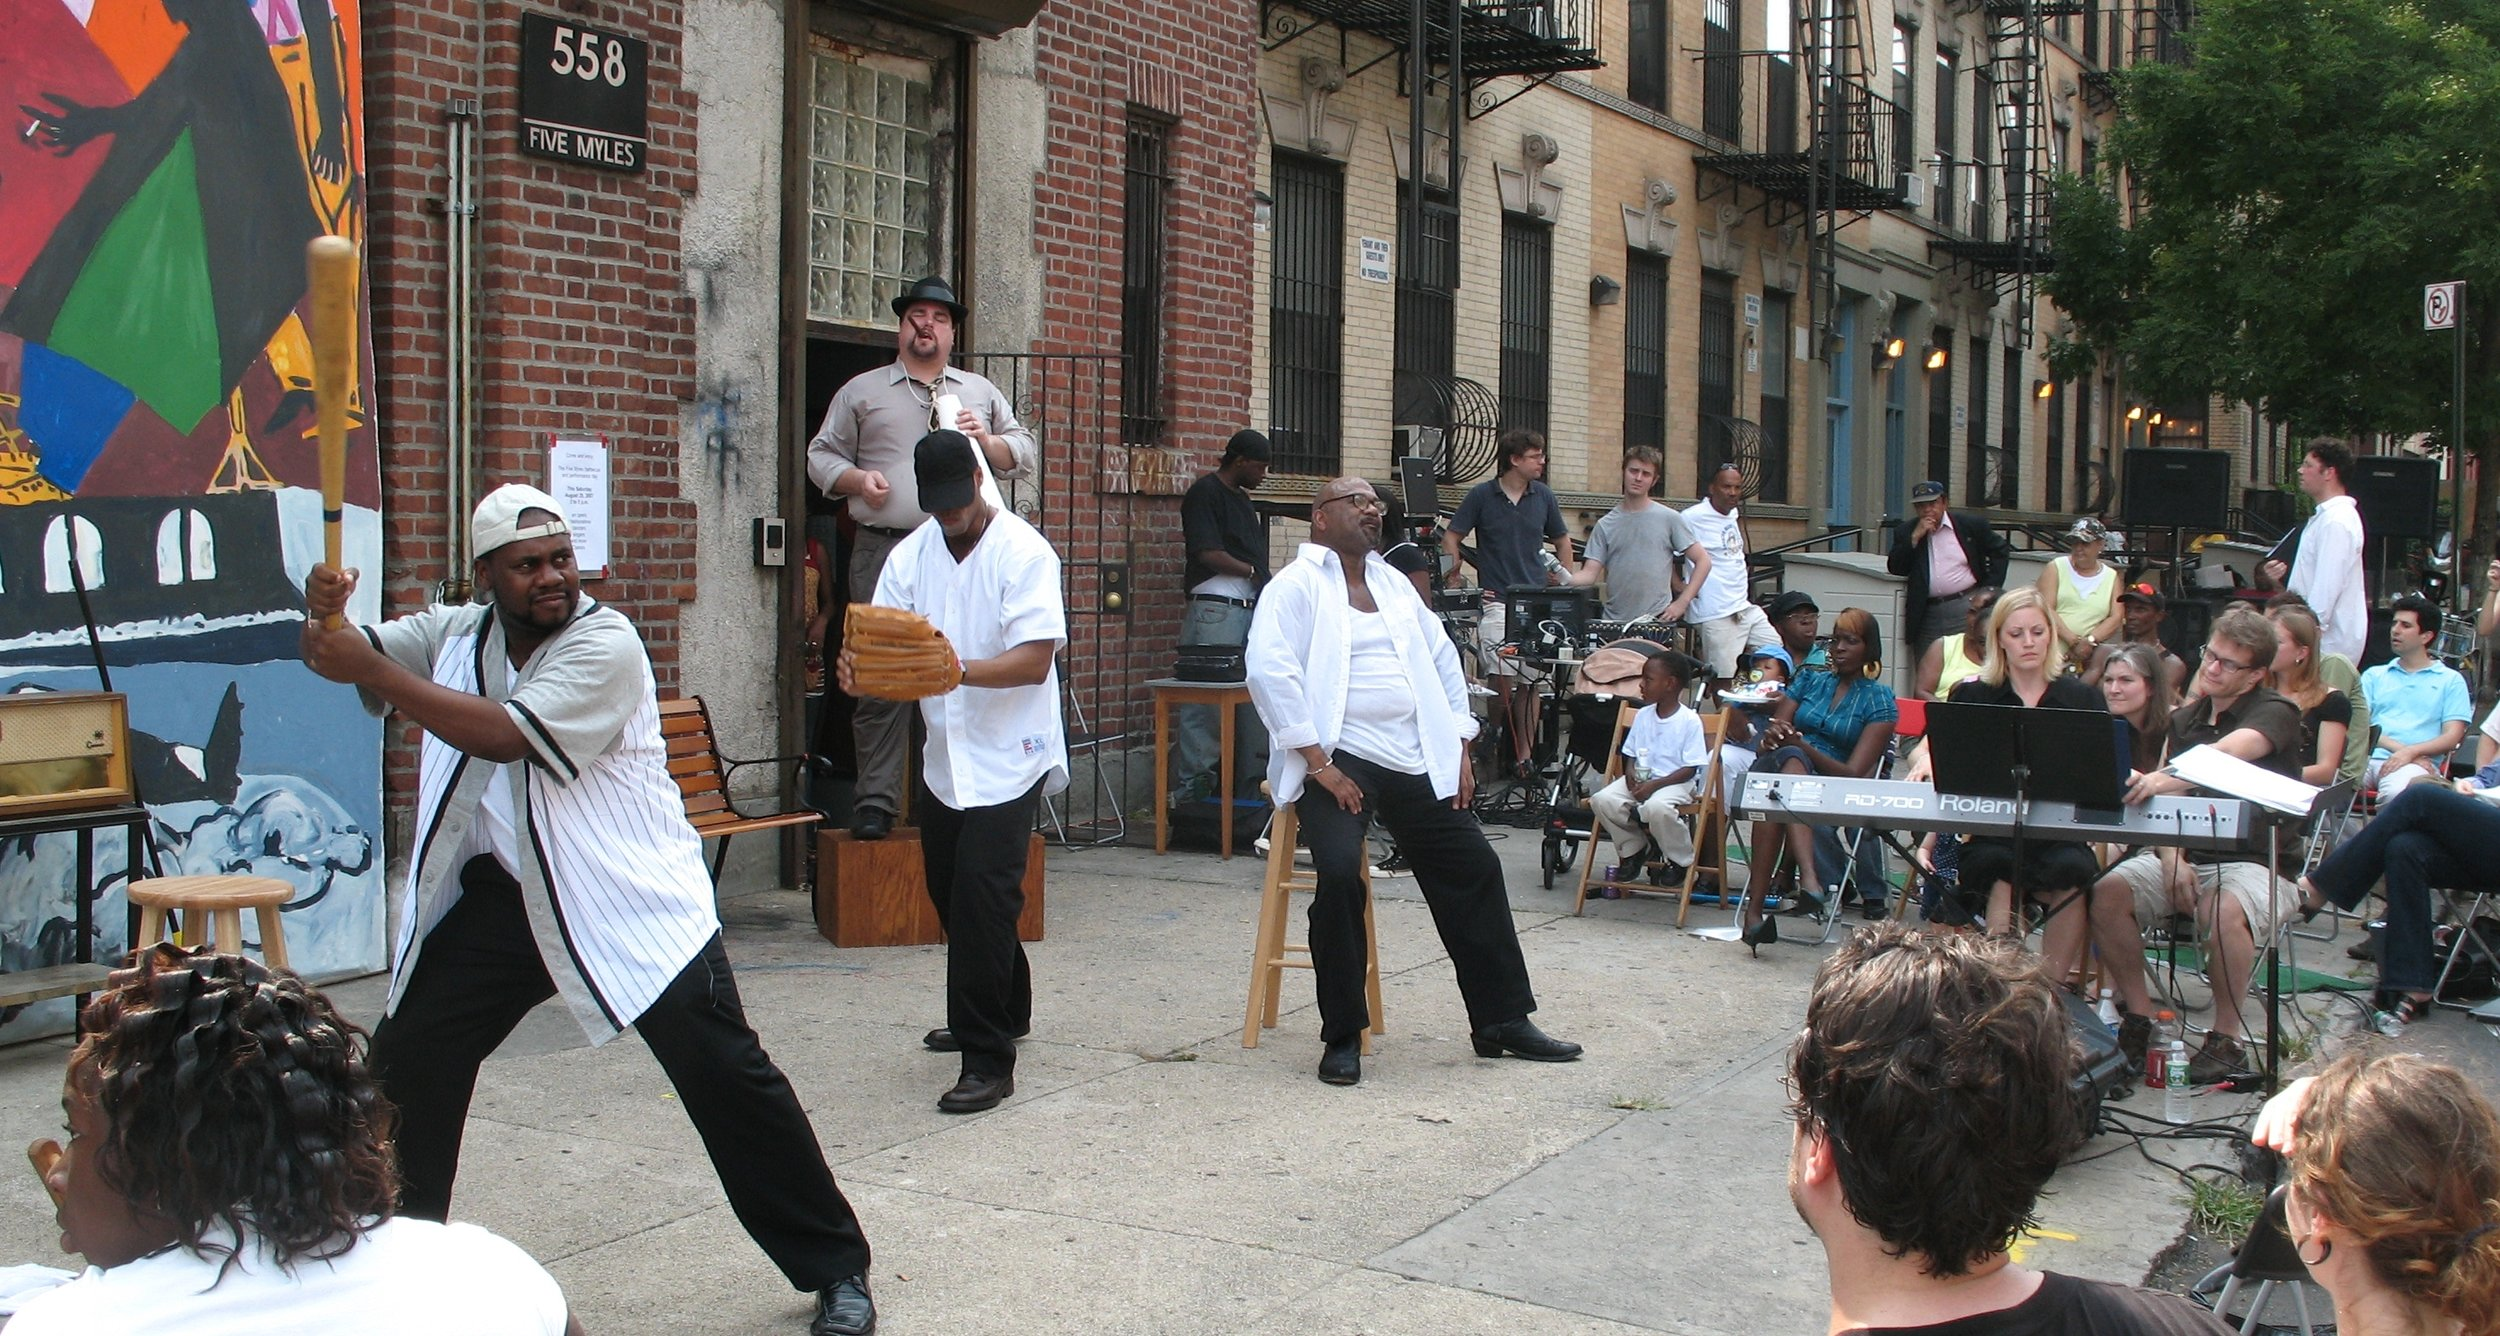 An early AOP workshop of The Summer King, held on a sidewalk in Brooklyn. Daniel Sonenberg's opera has its concert premiere in May.